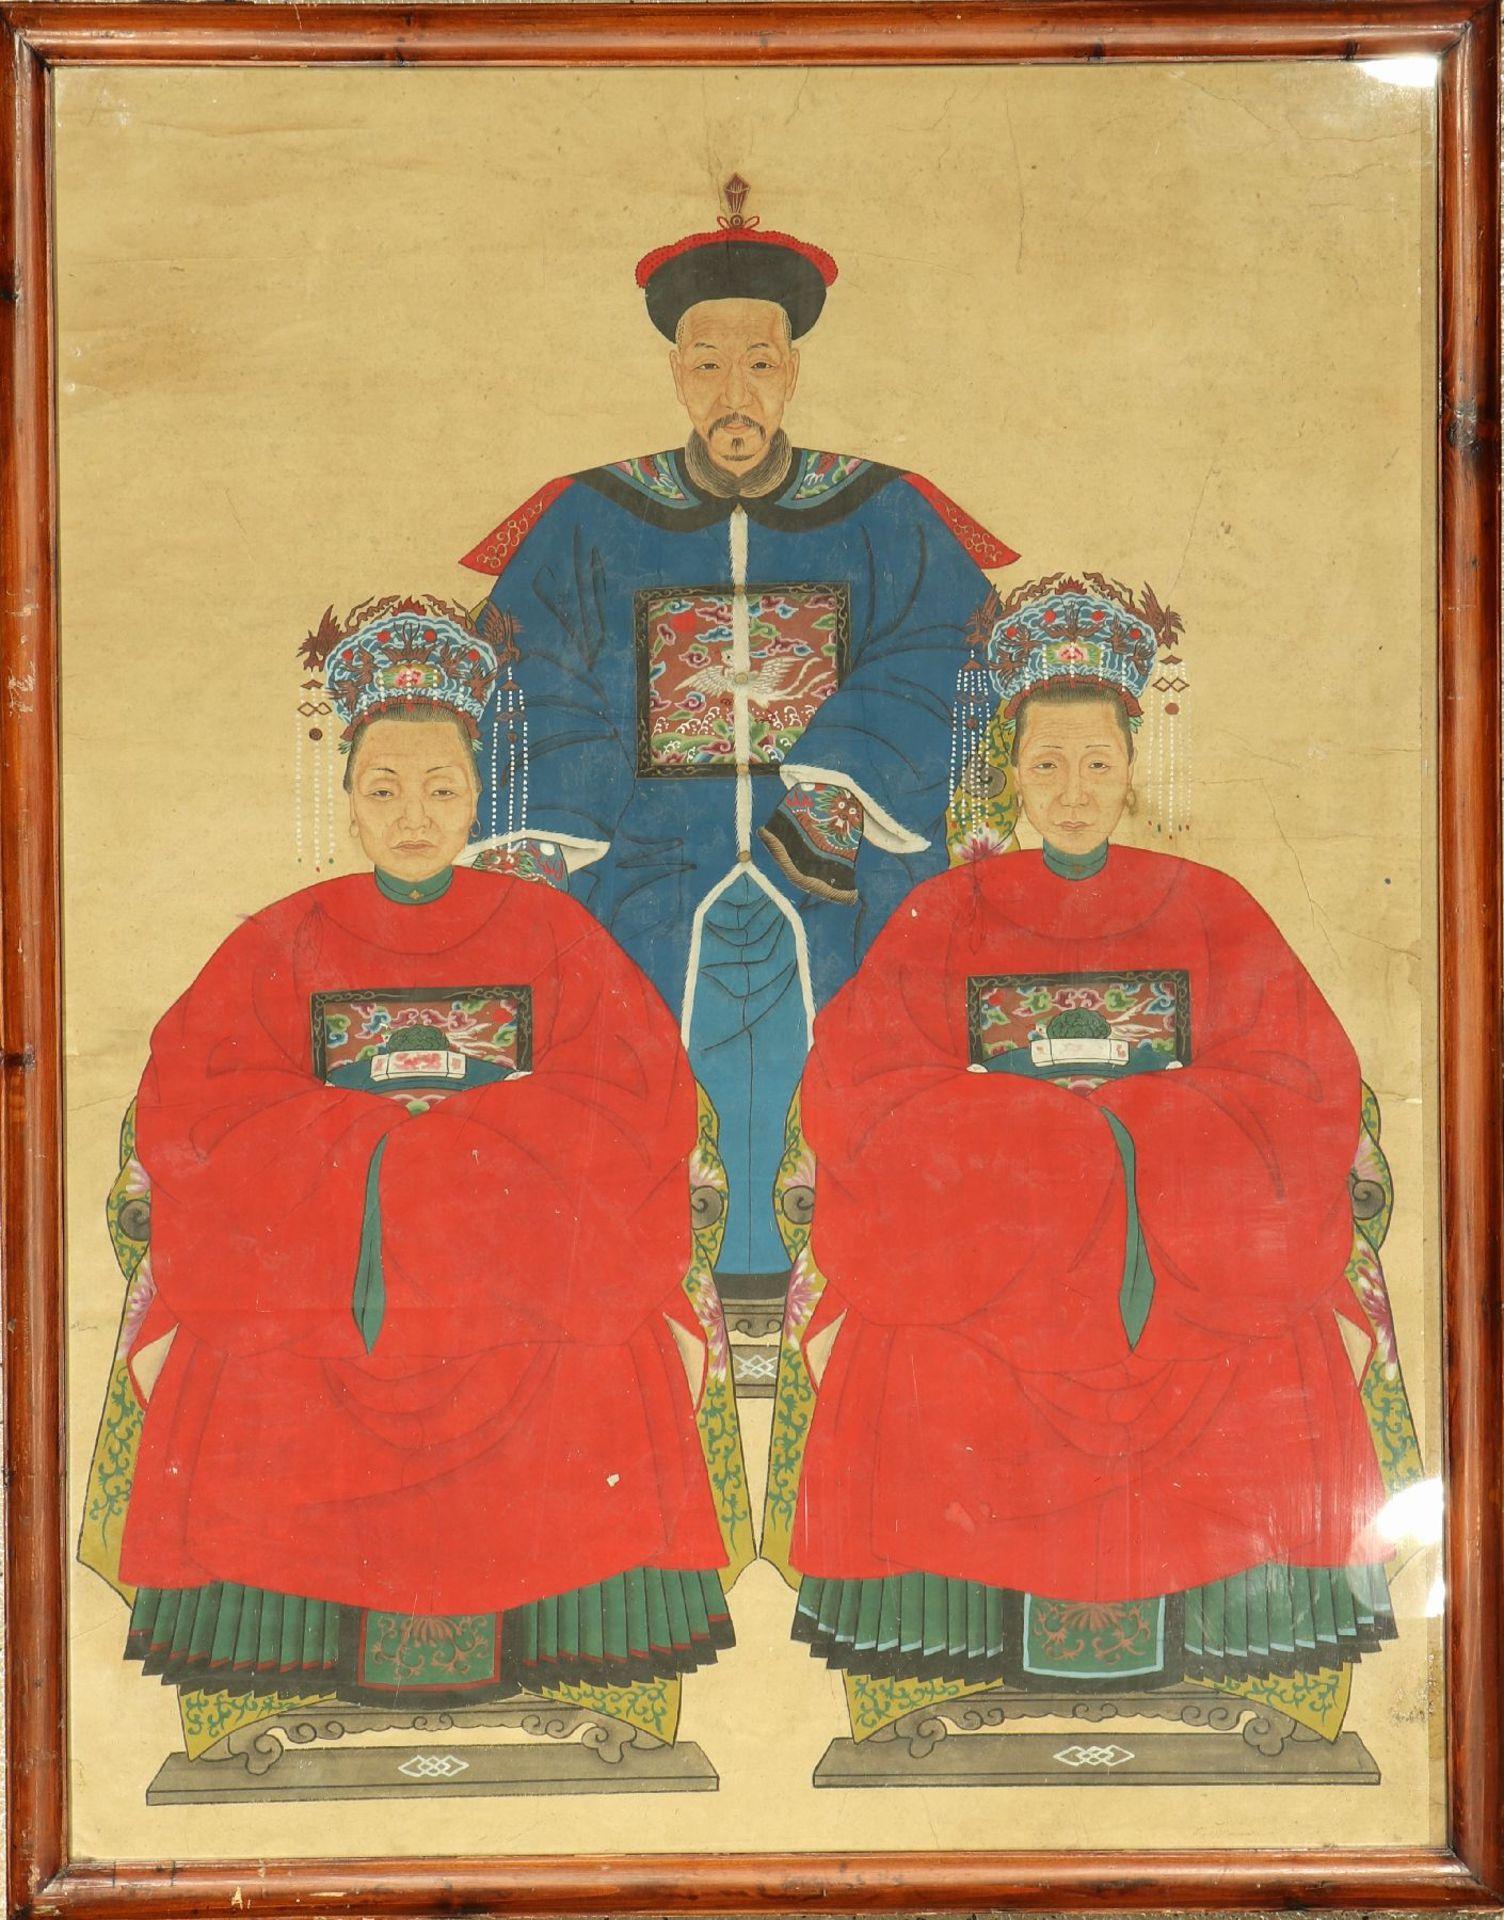 Ahnenbilder alt, China, um 1930-1950, Malerei, ca. 129 x 100 cm, original Rahmen, (Altersspuren)